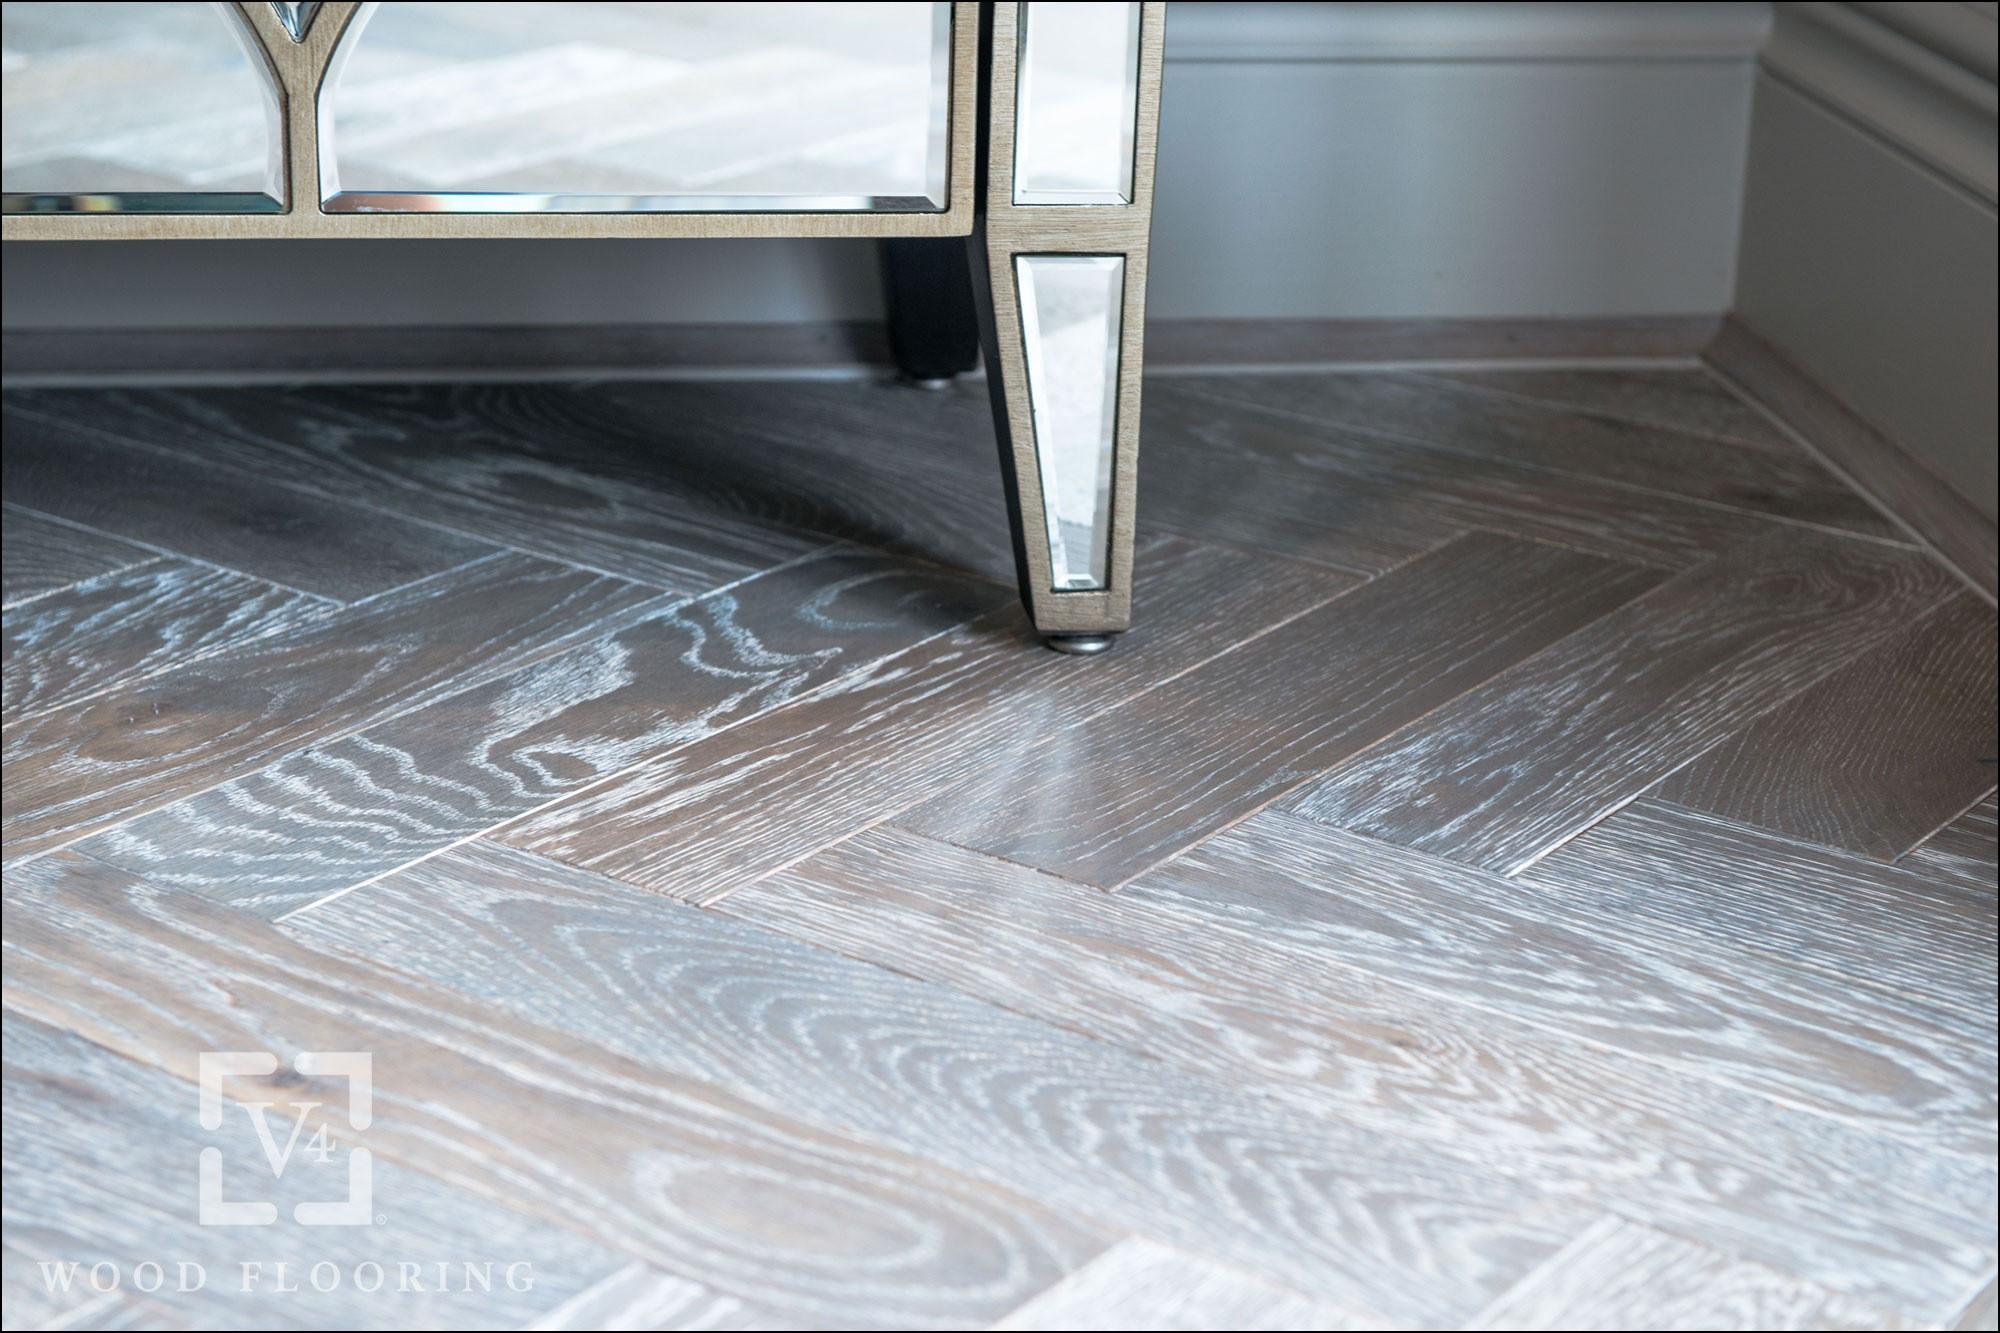 jasper prefinished oak hardwood flooring reviews of best place flooring ideas intended for best place for laminate flooring images v4 wood flooring at vincent flooring of best place for